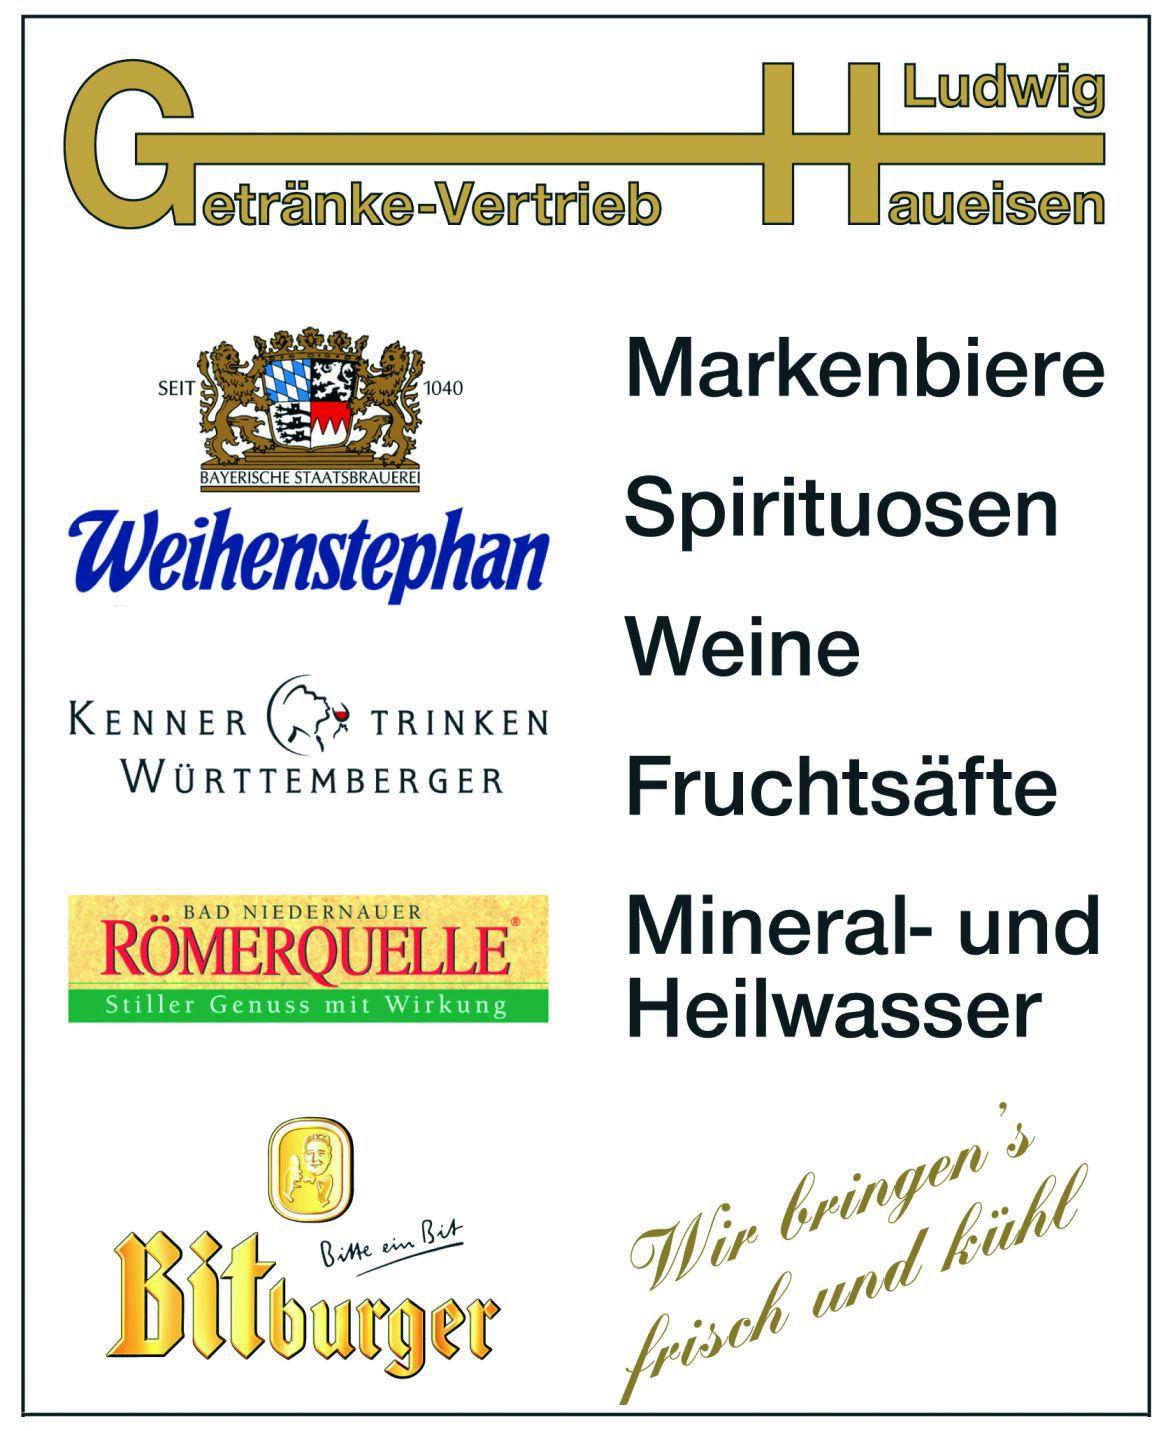 Getränke-Vertrieb Ludwig Haueisen